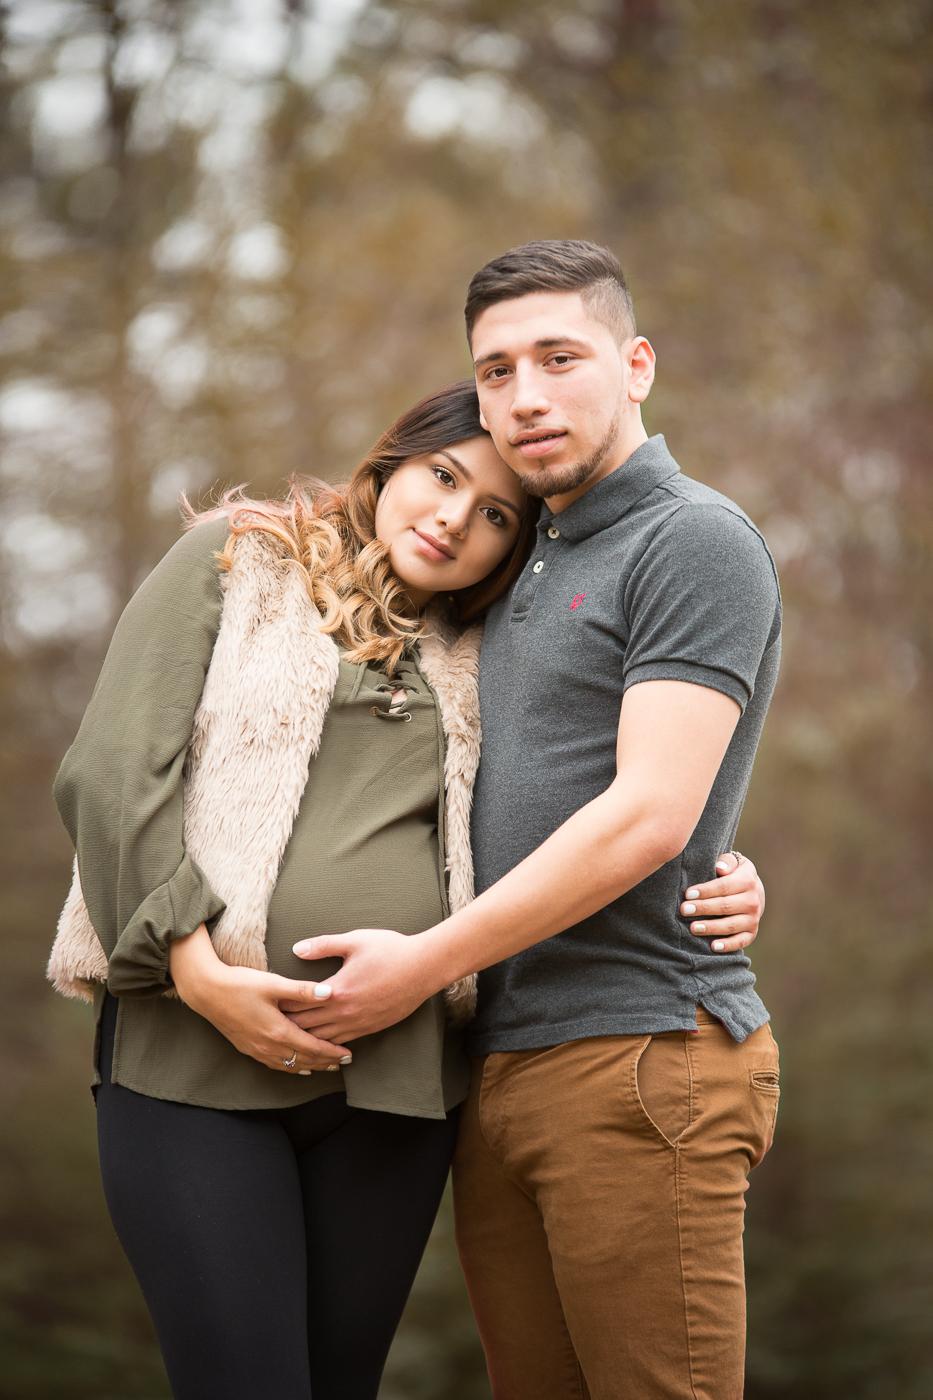 Atlanta Gwinnett Maternity Photography.jpg